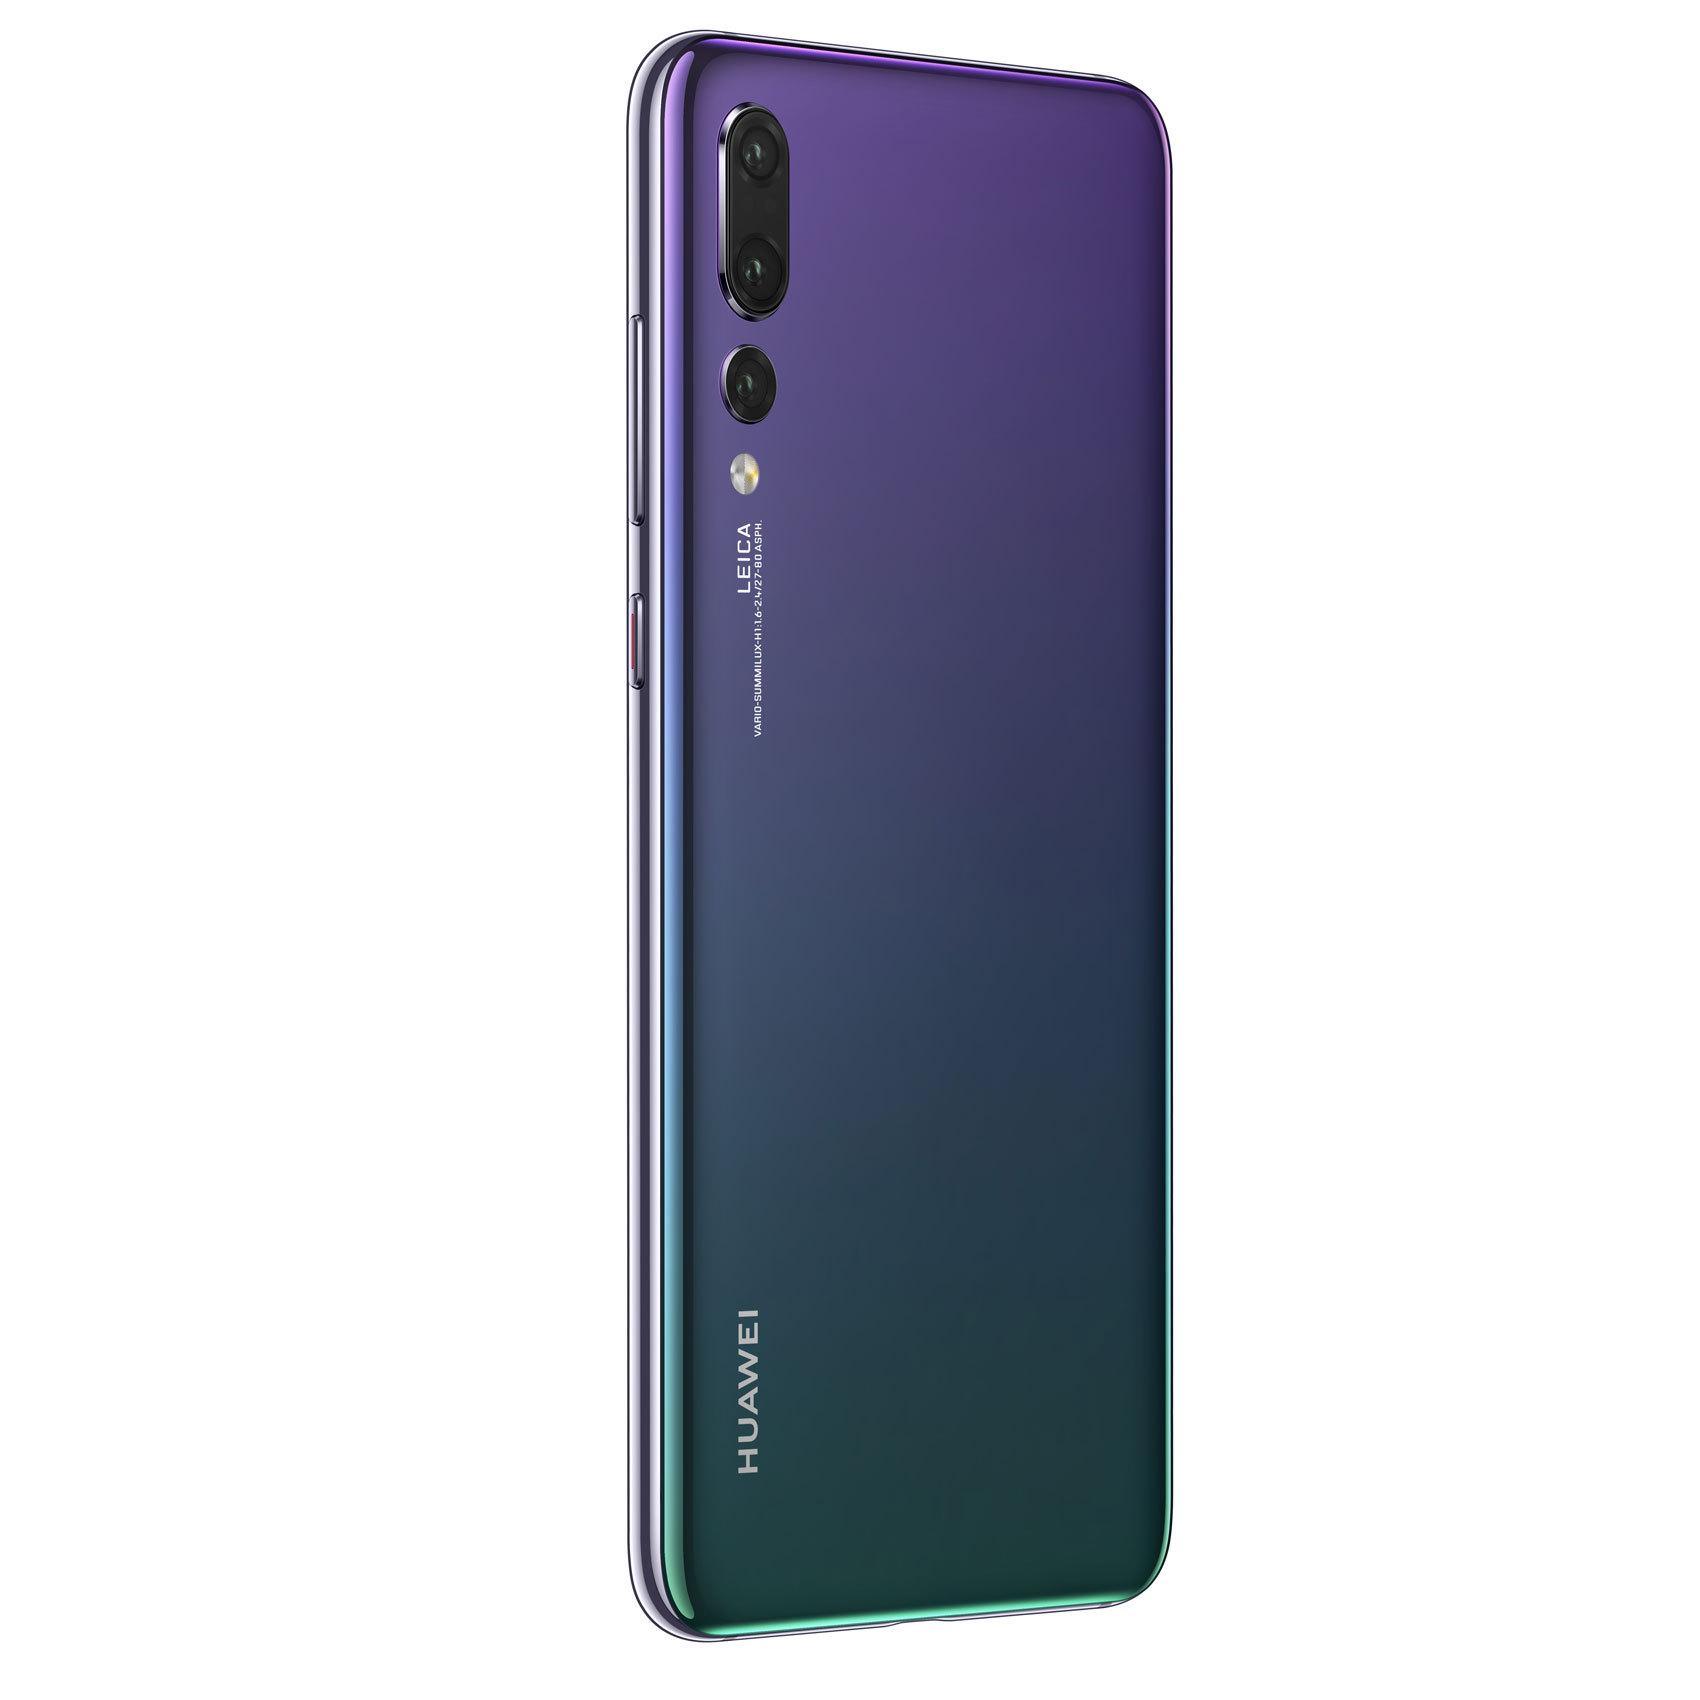 HUAWEI P20 PRO 128GB DS 4G PURPLE